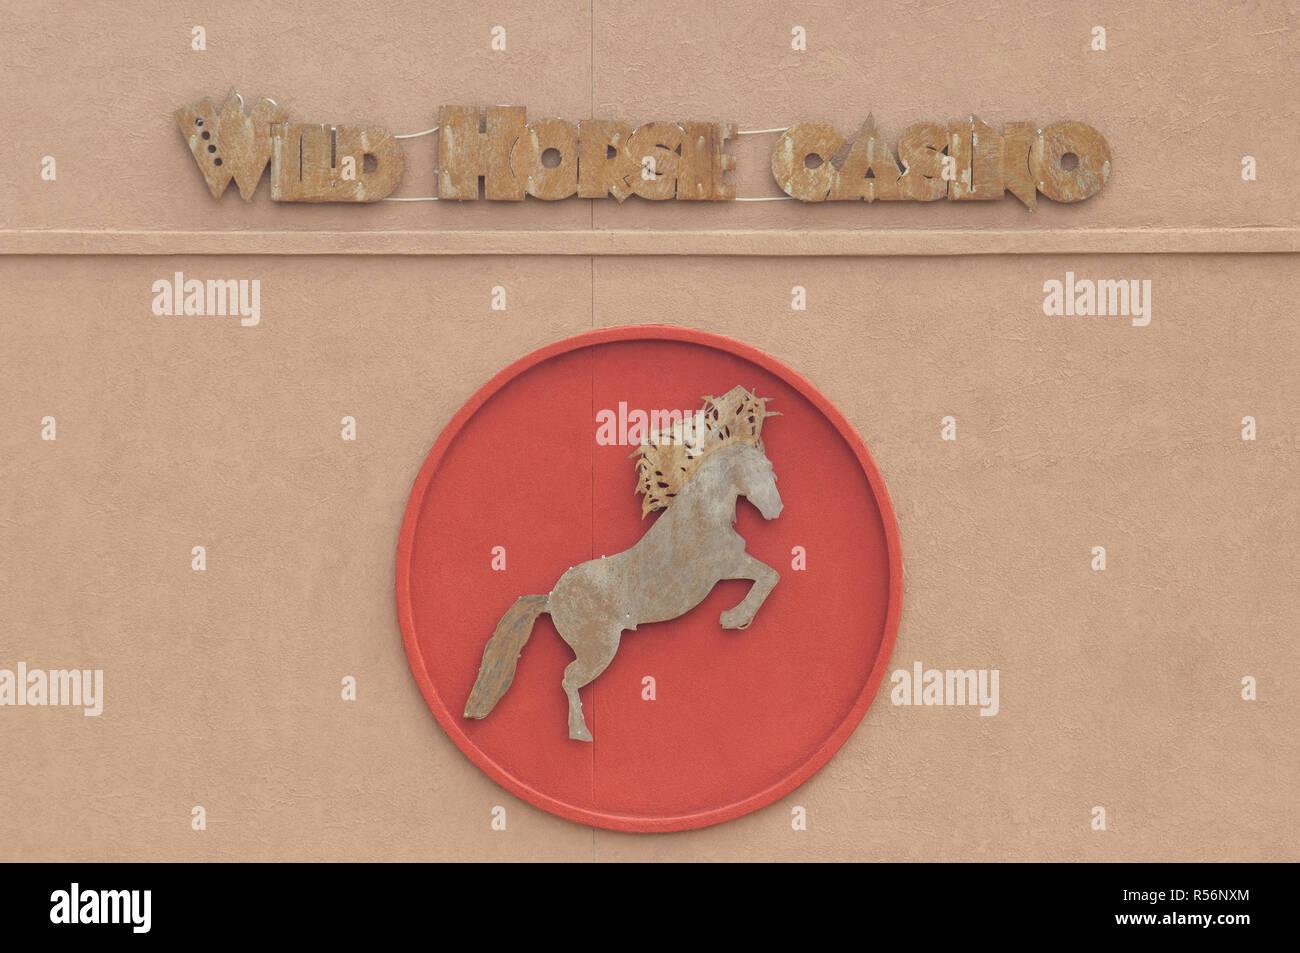 Wild Horse Casino sign, Jicarilla Apache Reservation, Dulce, New Mexico. Digital photograph - Stock Image